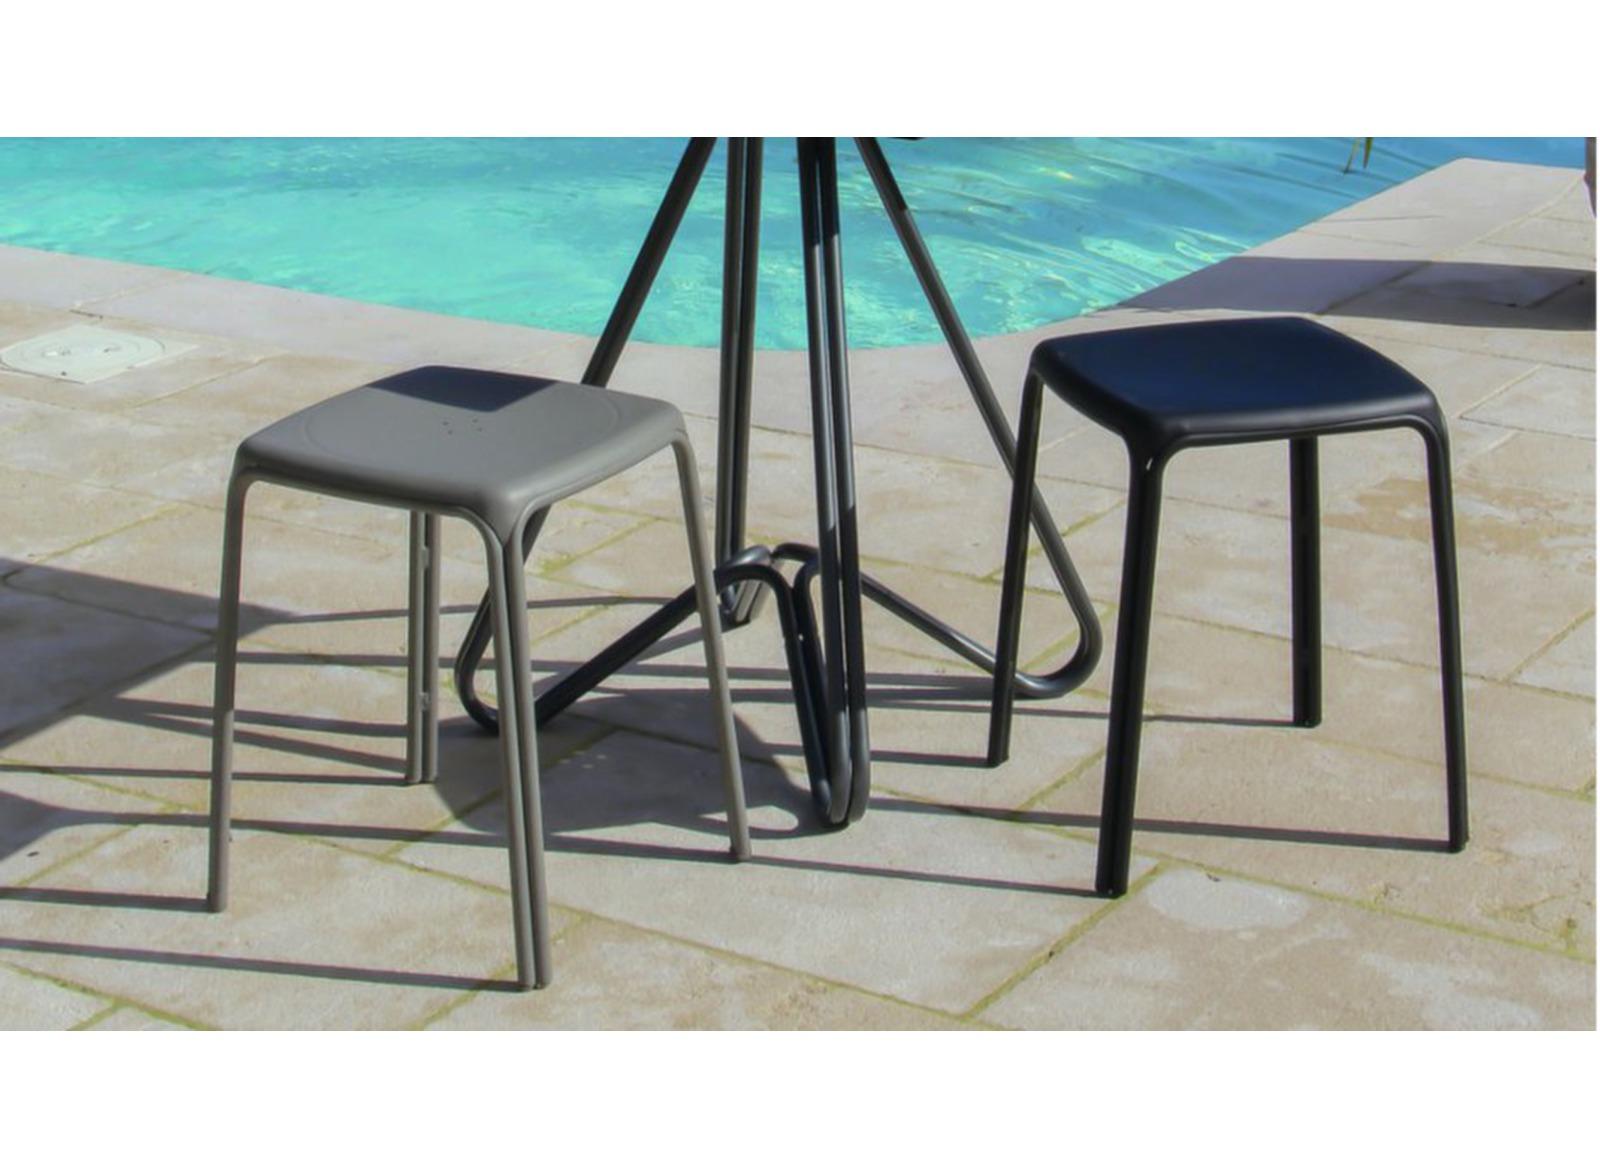 tabouret azuro light grey tabourets pour le jardin mobilier de jardin proloisirs. Black Bedroom Furniture Sets. Home Design Ideas